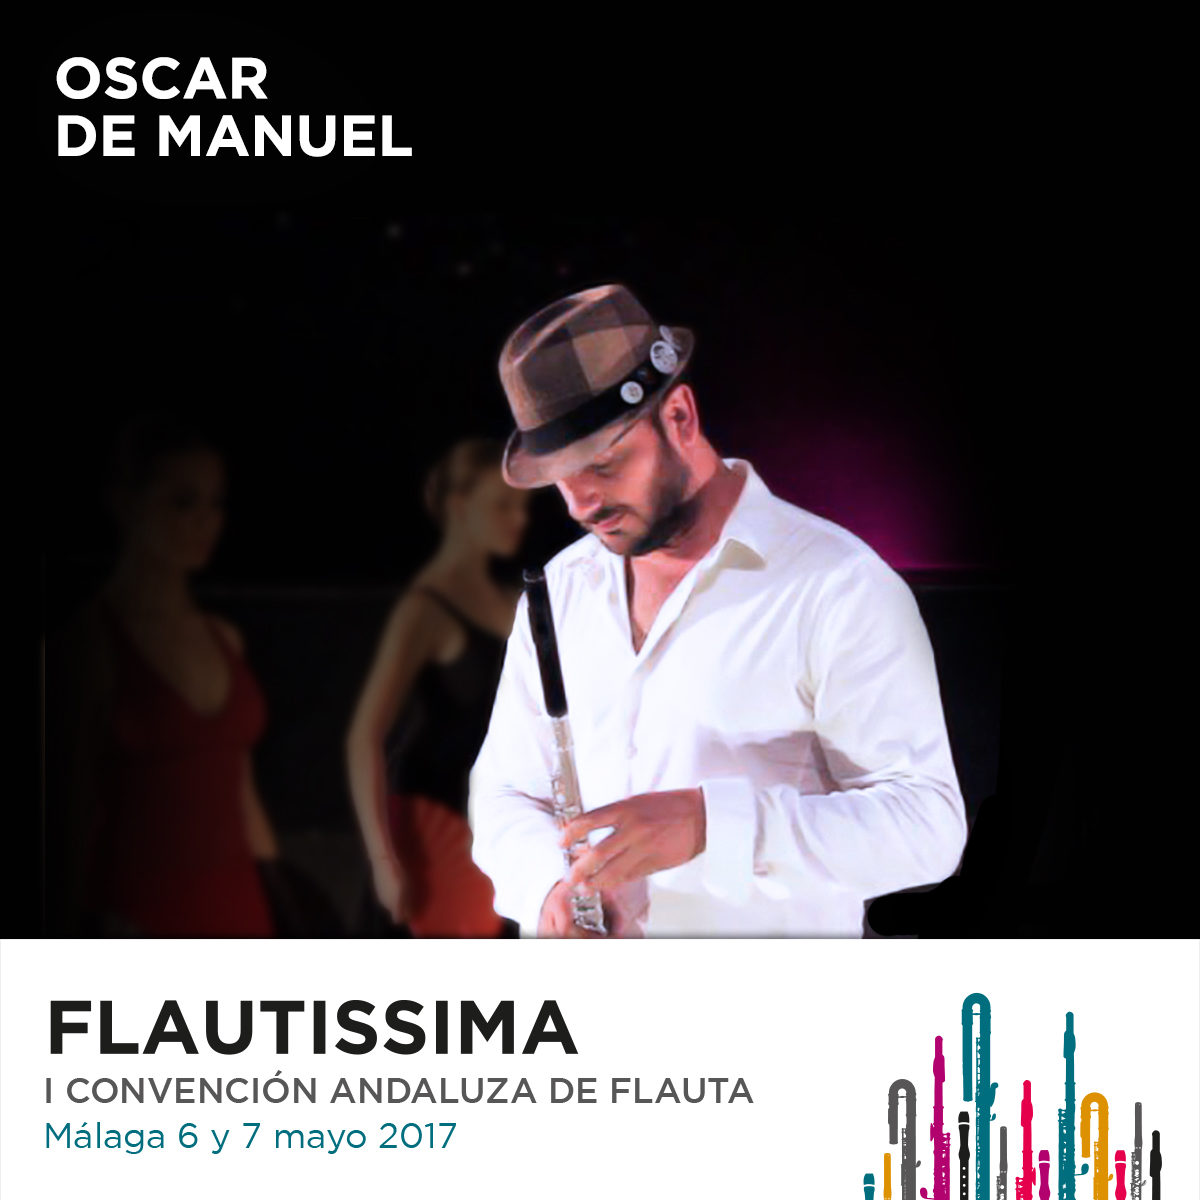 Oscar de Manuel Flautissima